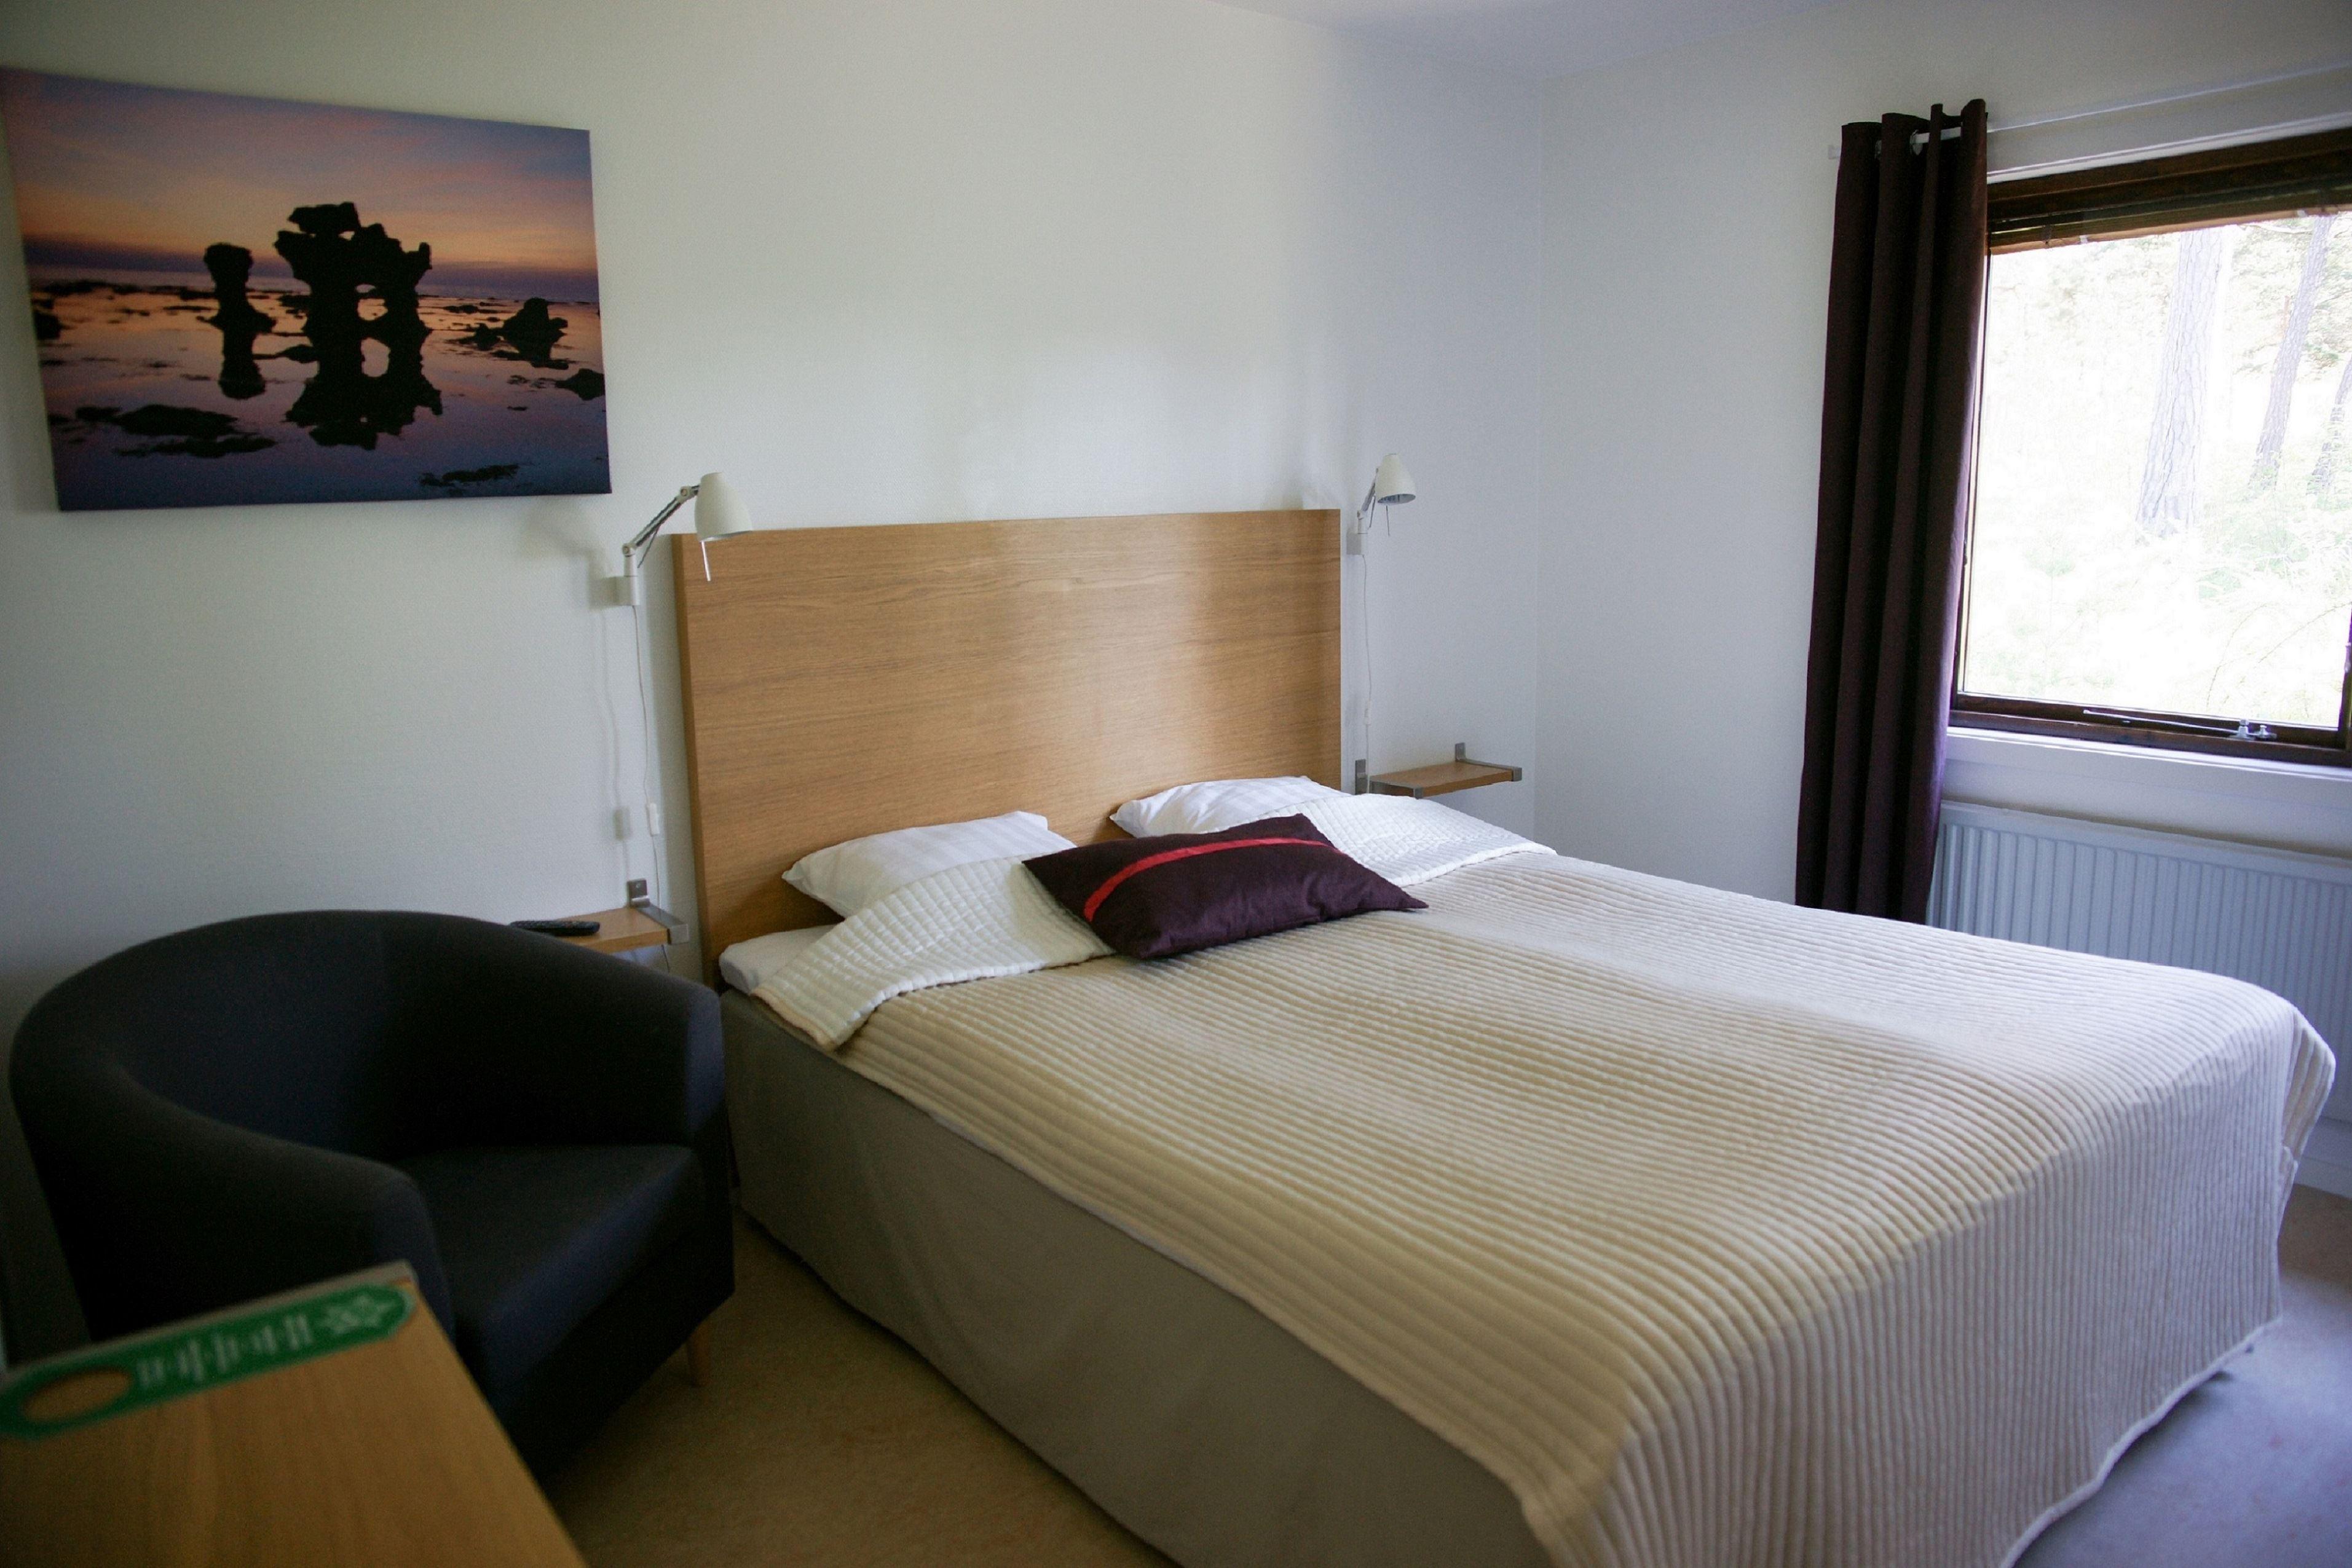 Gotlands IdrottsCenters Hotel